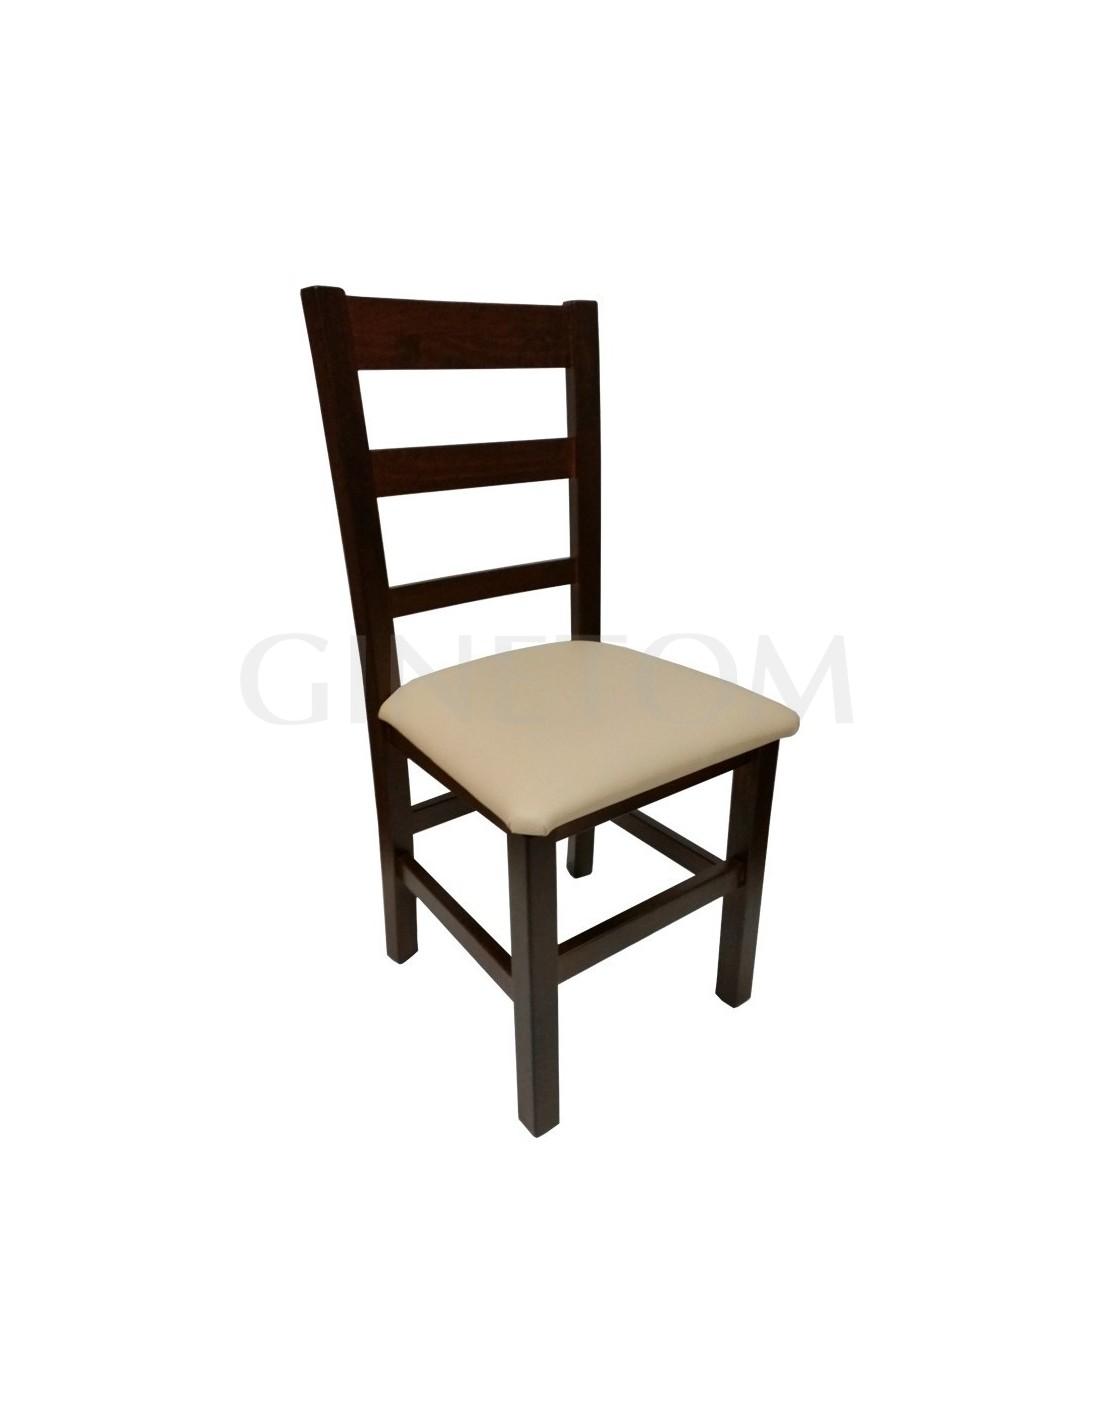 Sillas de madera ref 146 sillas hosteler a de ginetom for Sillas hosteleria